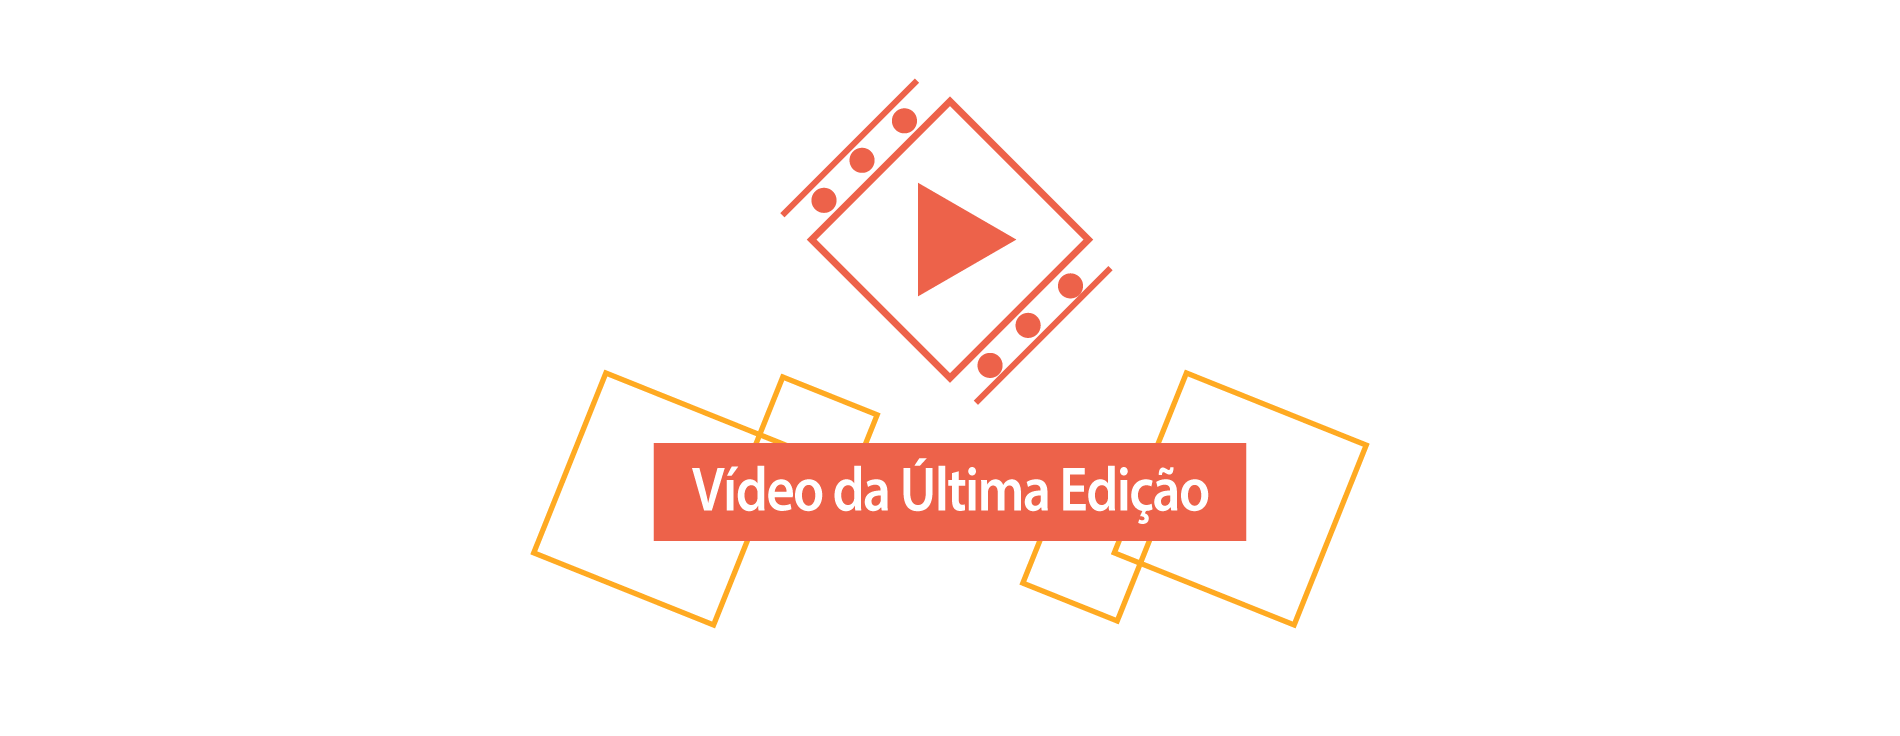 https://www.mestregp.com.br/wp-content/uploads/2018/03/Pagina-Fórum-SP-b-video-1900x736.png